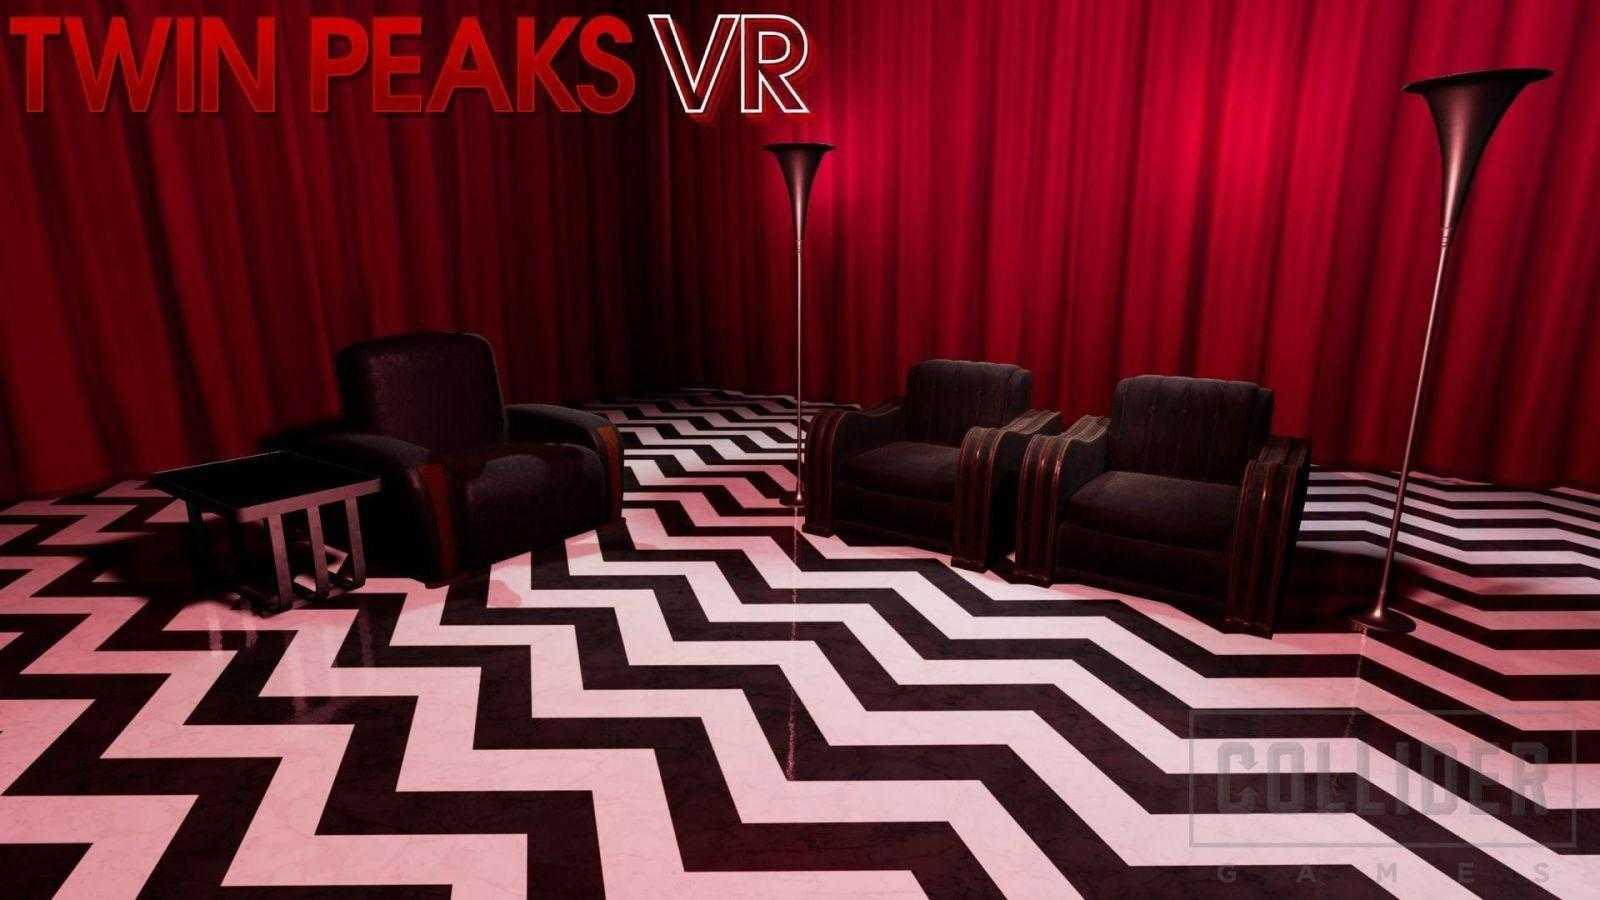 Twin Peaks VR проведет игроков в Черный вигвам (twin peaks vr image 2)